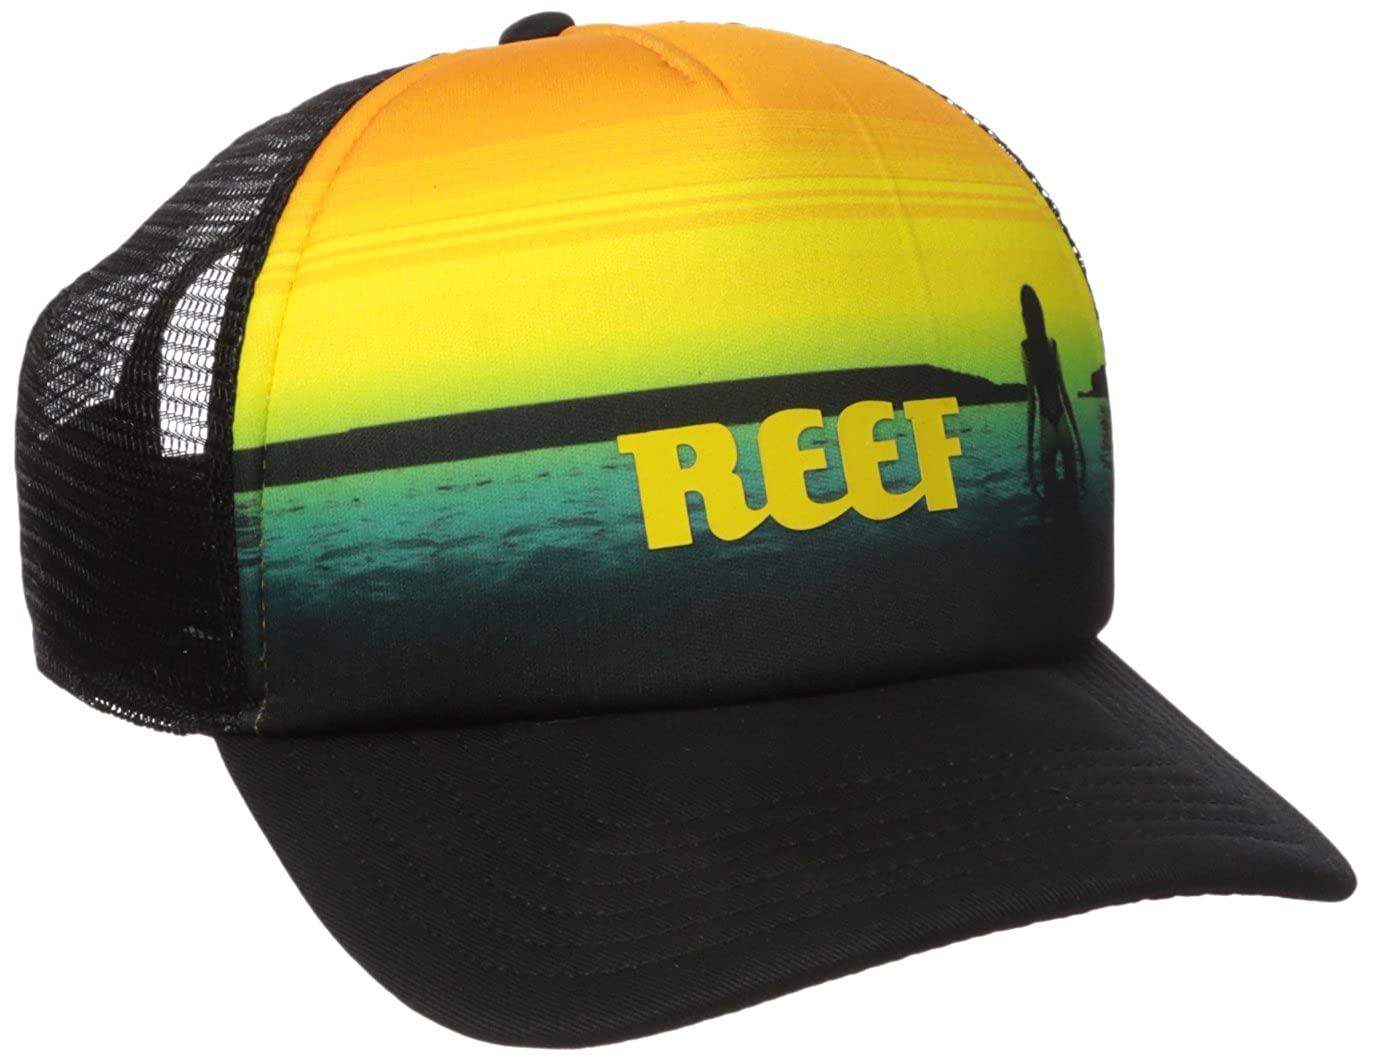 Reef - Gorra de béisbol - para Hombre Negro Talla única: Amazon.es ...